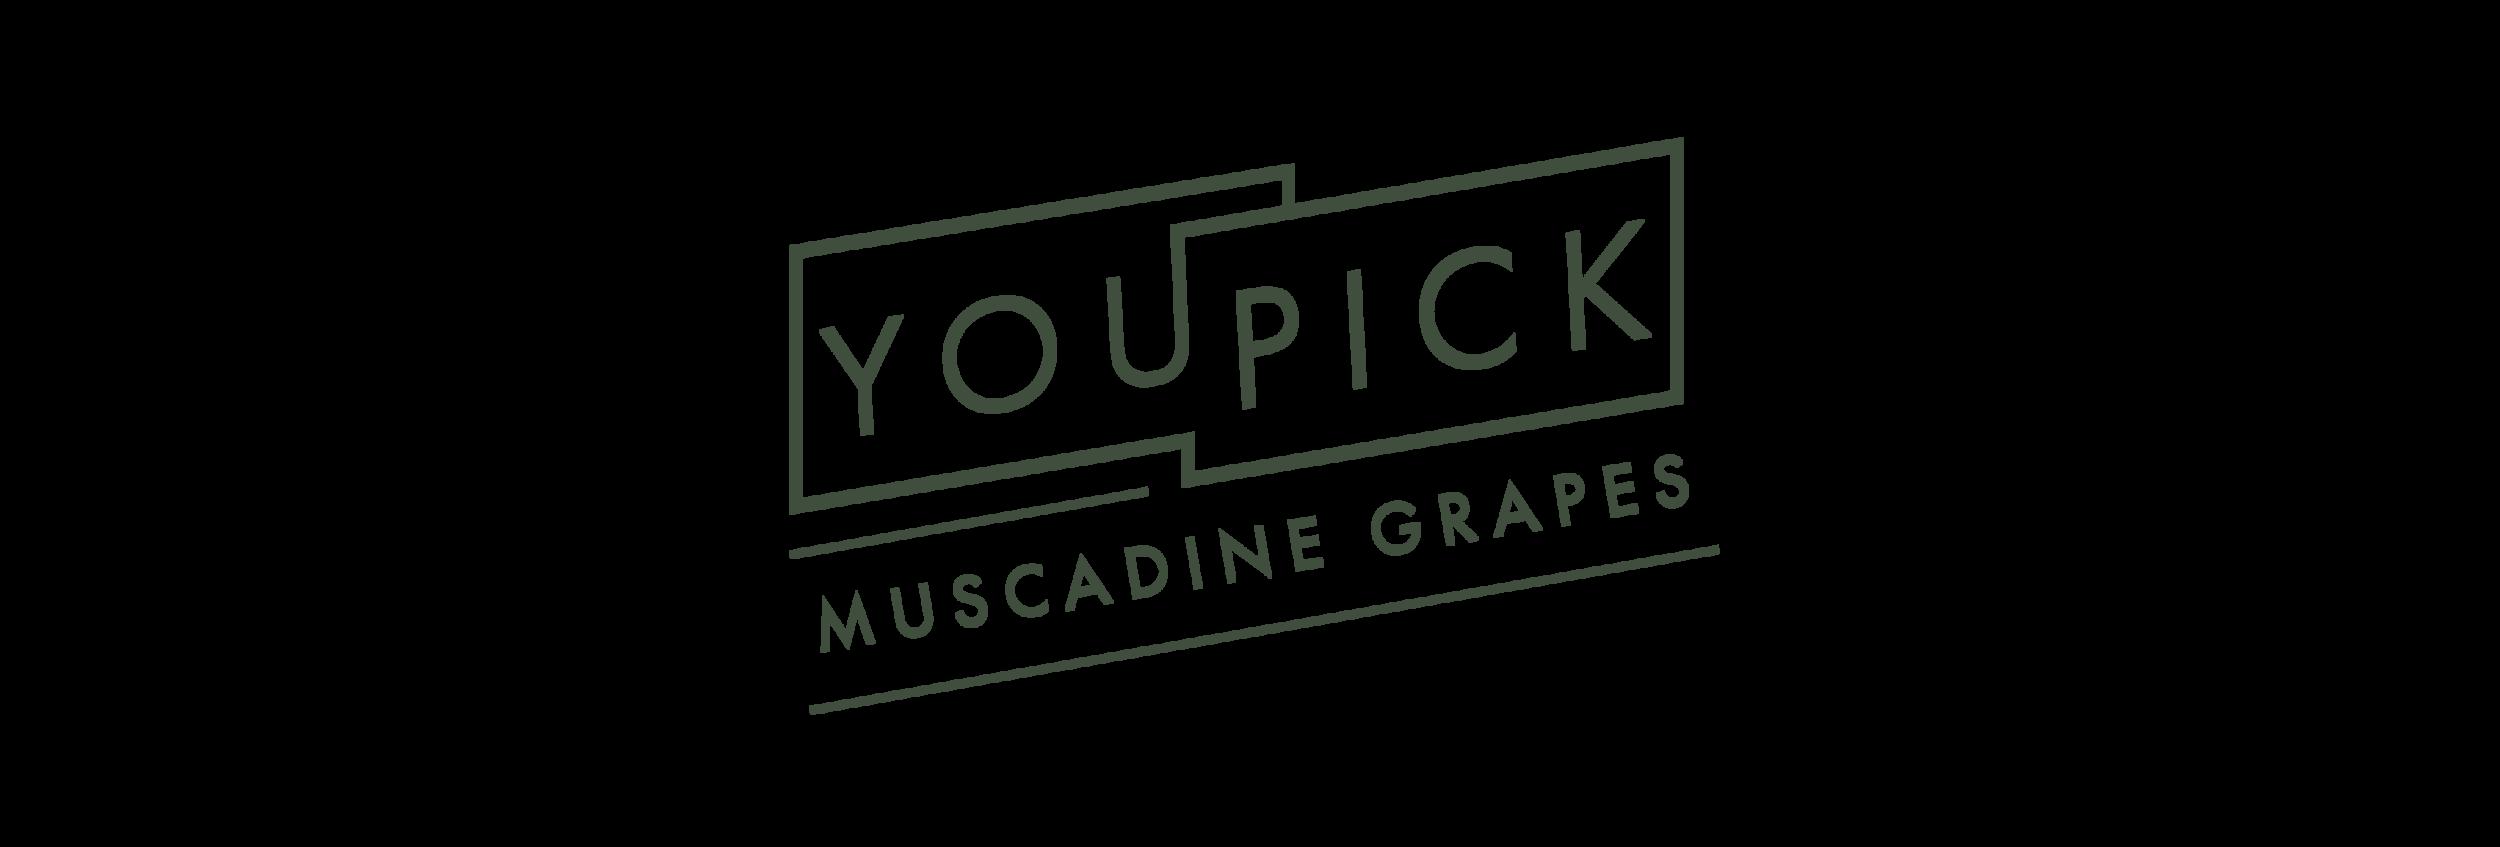 YouPick-03.png